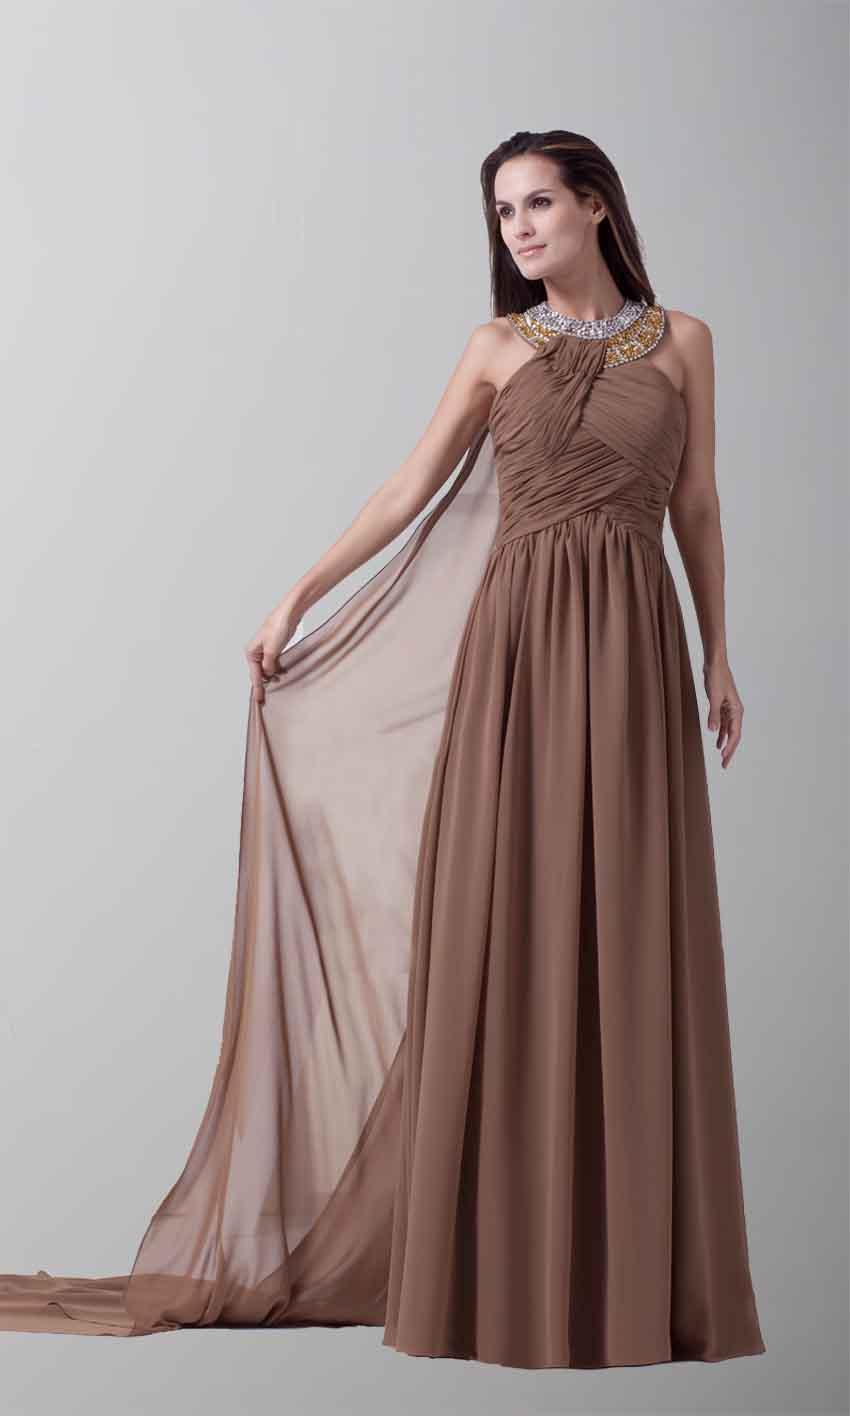 Amazing Halter Sideling Drape Long Evening Dresses KSP220 [KSP220 ...